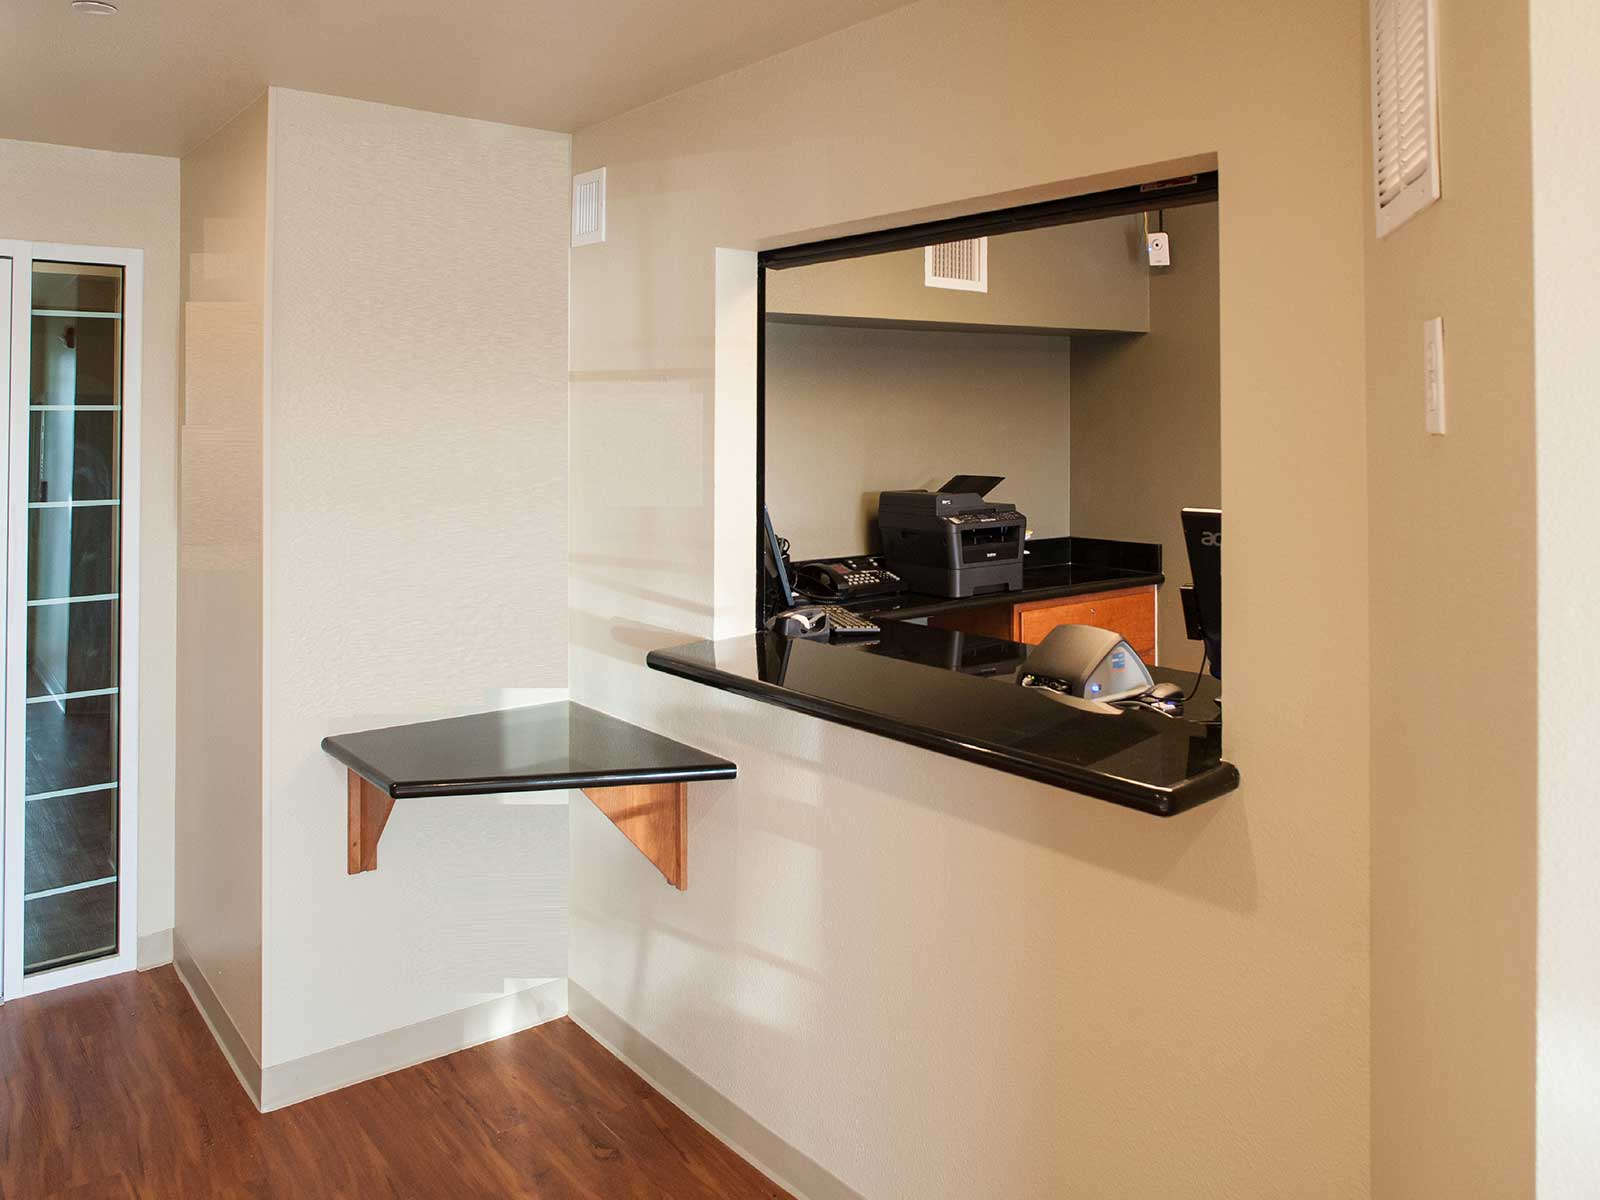 WoodSpring Suites Kansas City Mission image 10